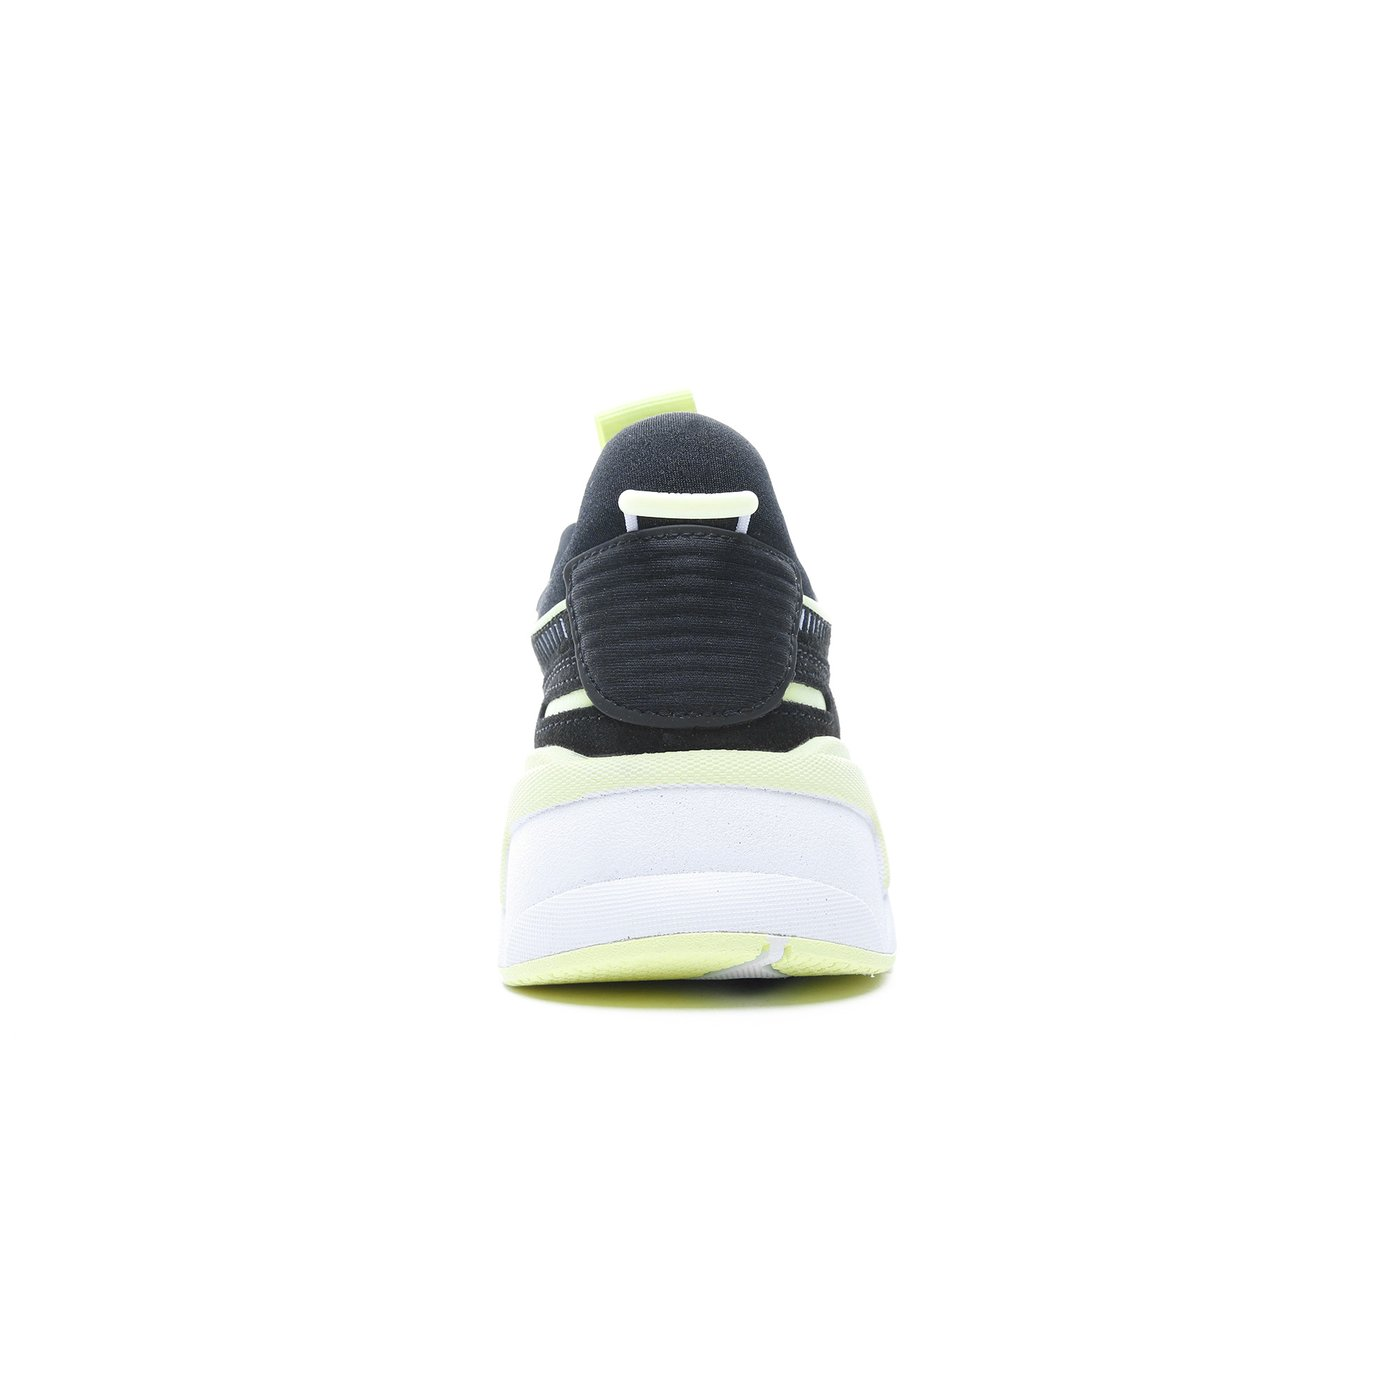 Puma RS-X Reinvent Kadın Siyah Spor Ayakkabı